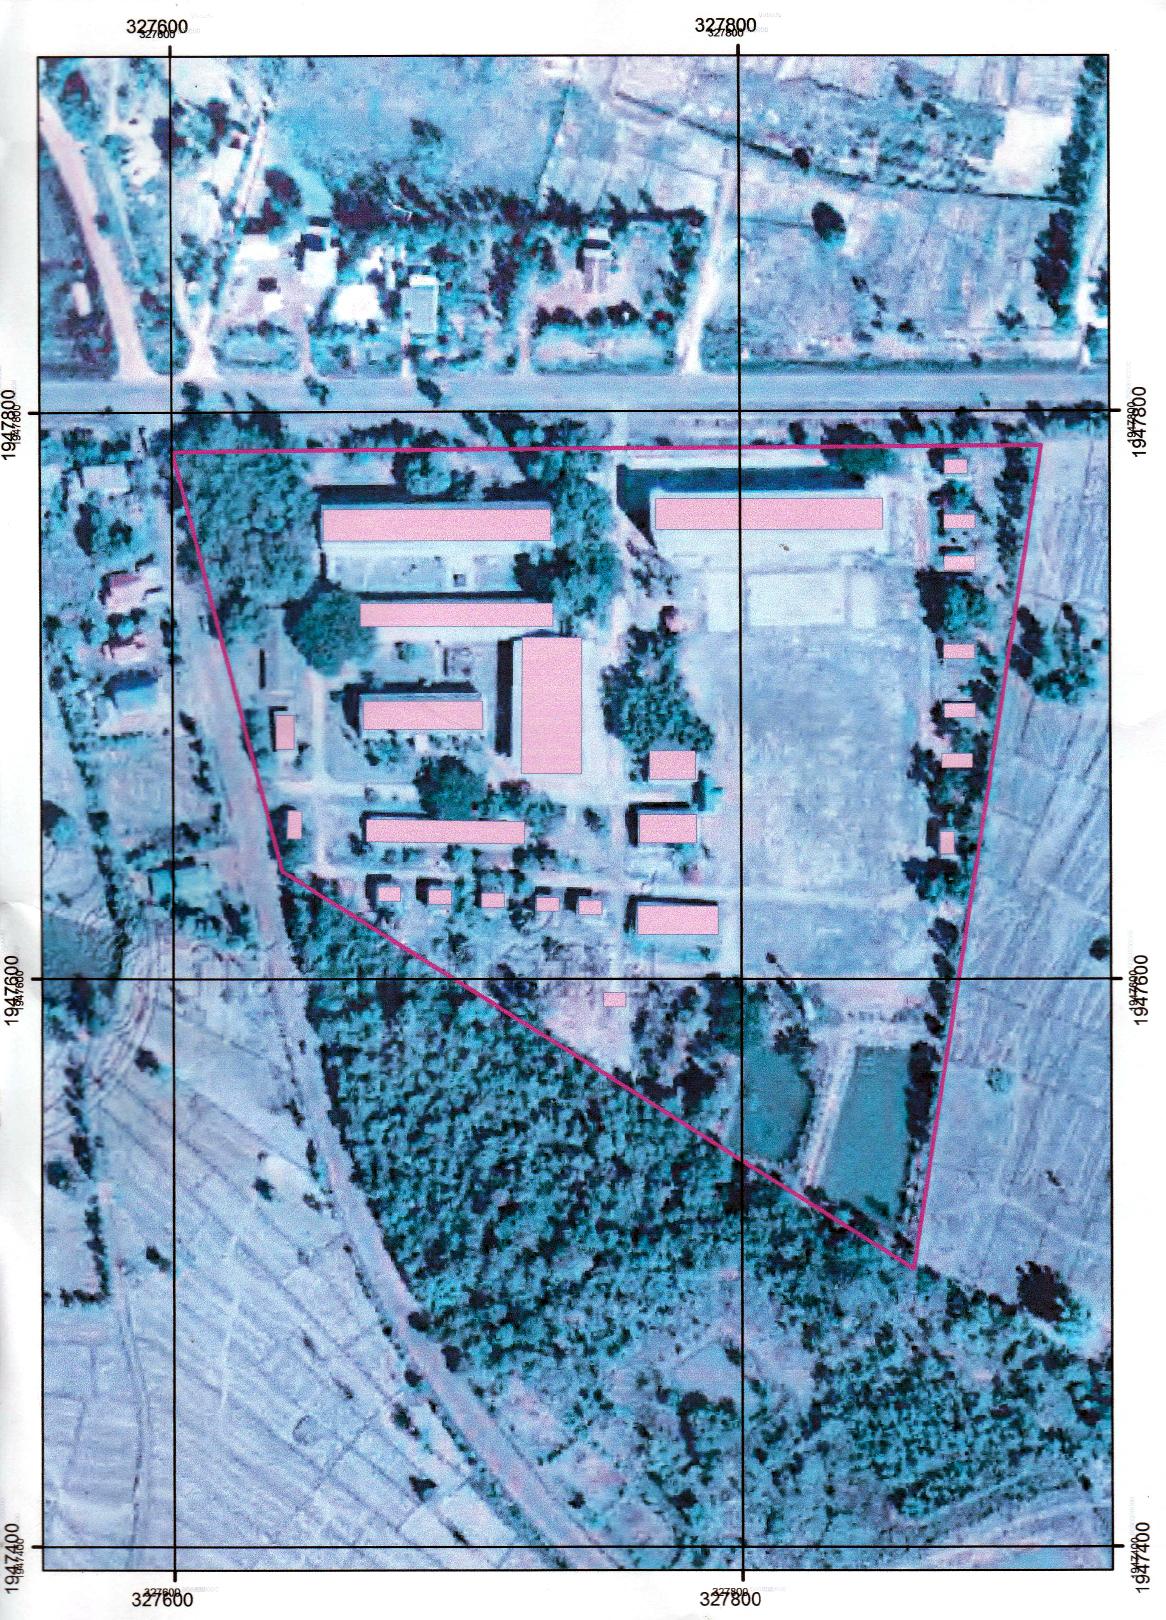 000-map-satellite.jpg